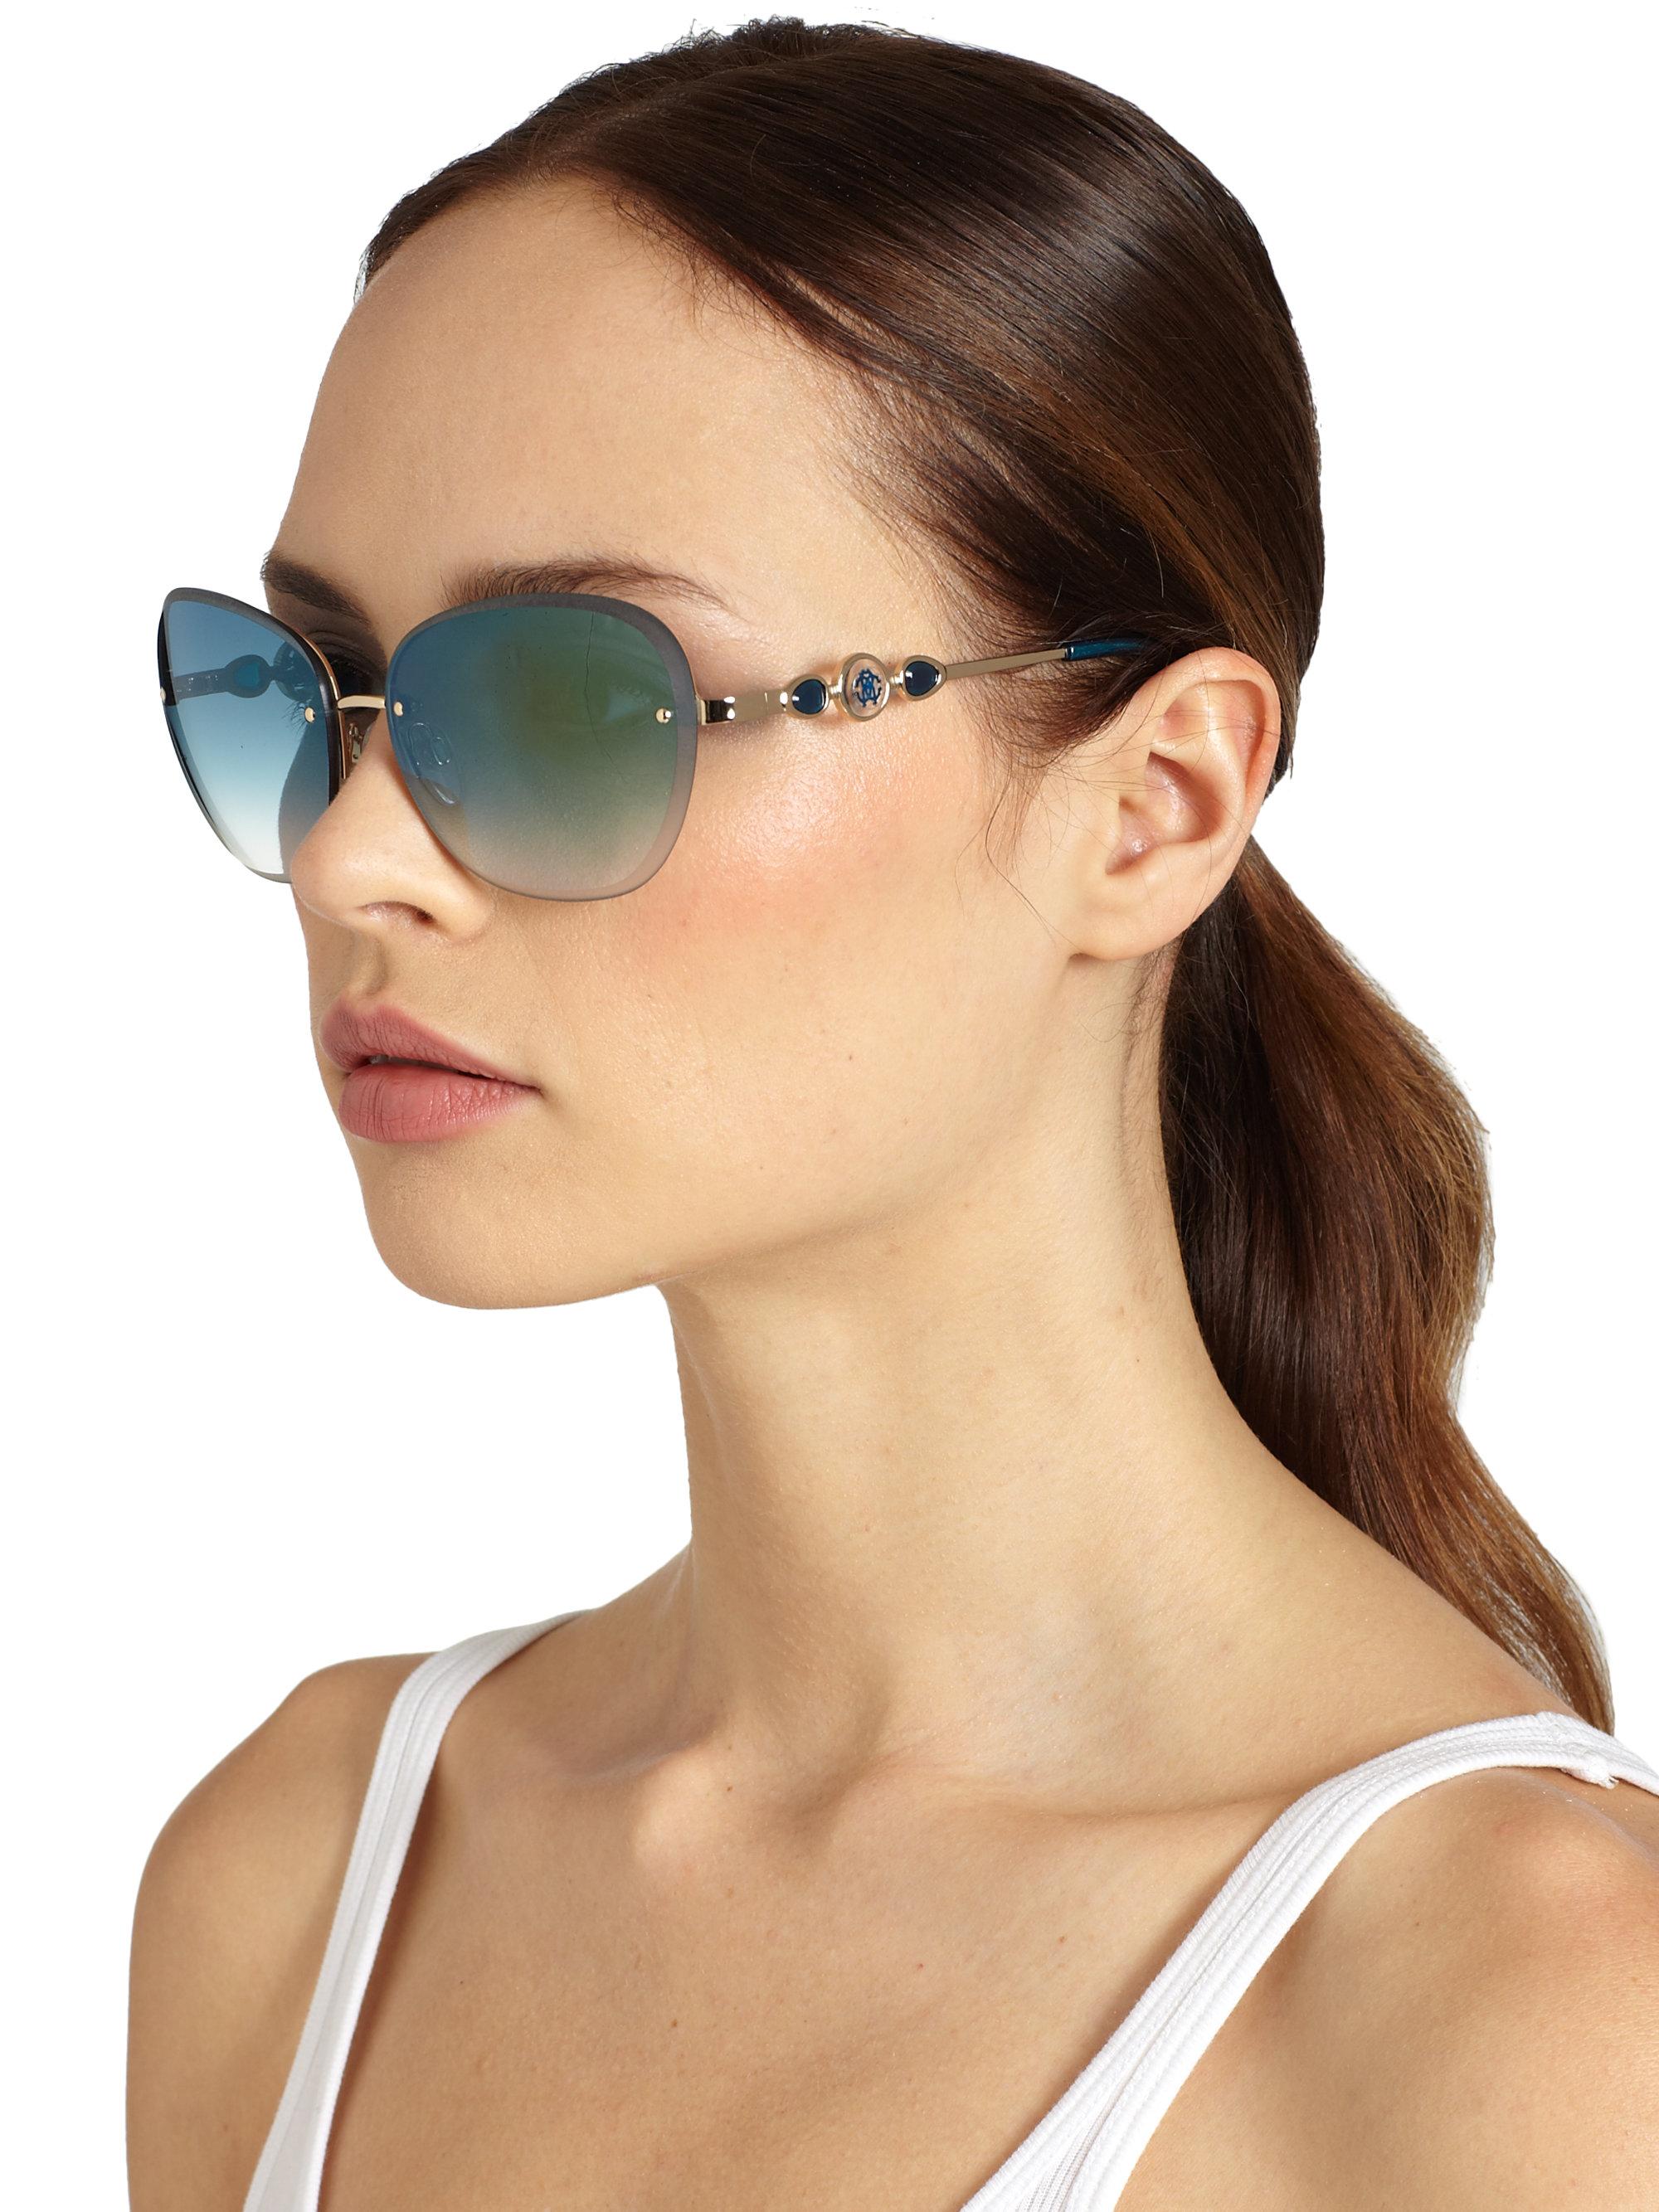 Frameless Circle Glasses : Roberto cavalli Rimless Round Sunglasses in Blue Lyst